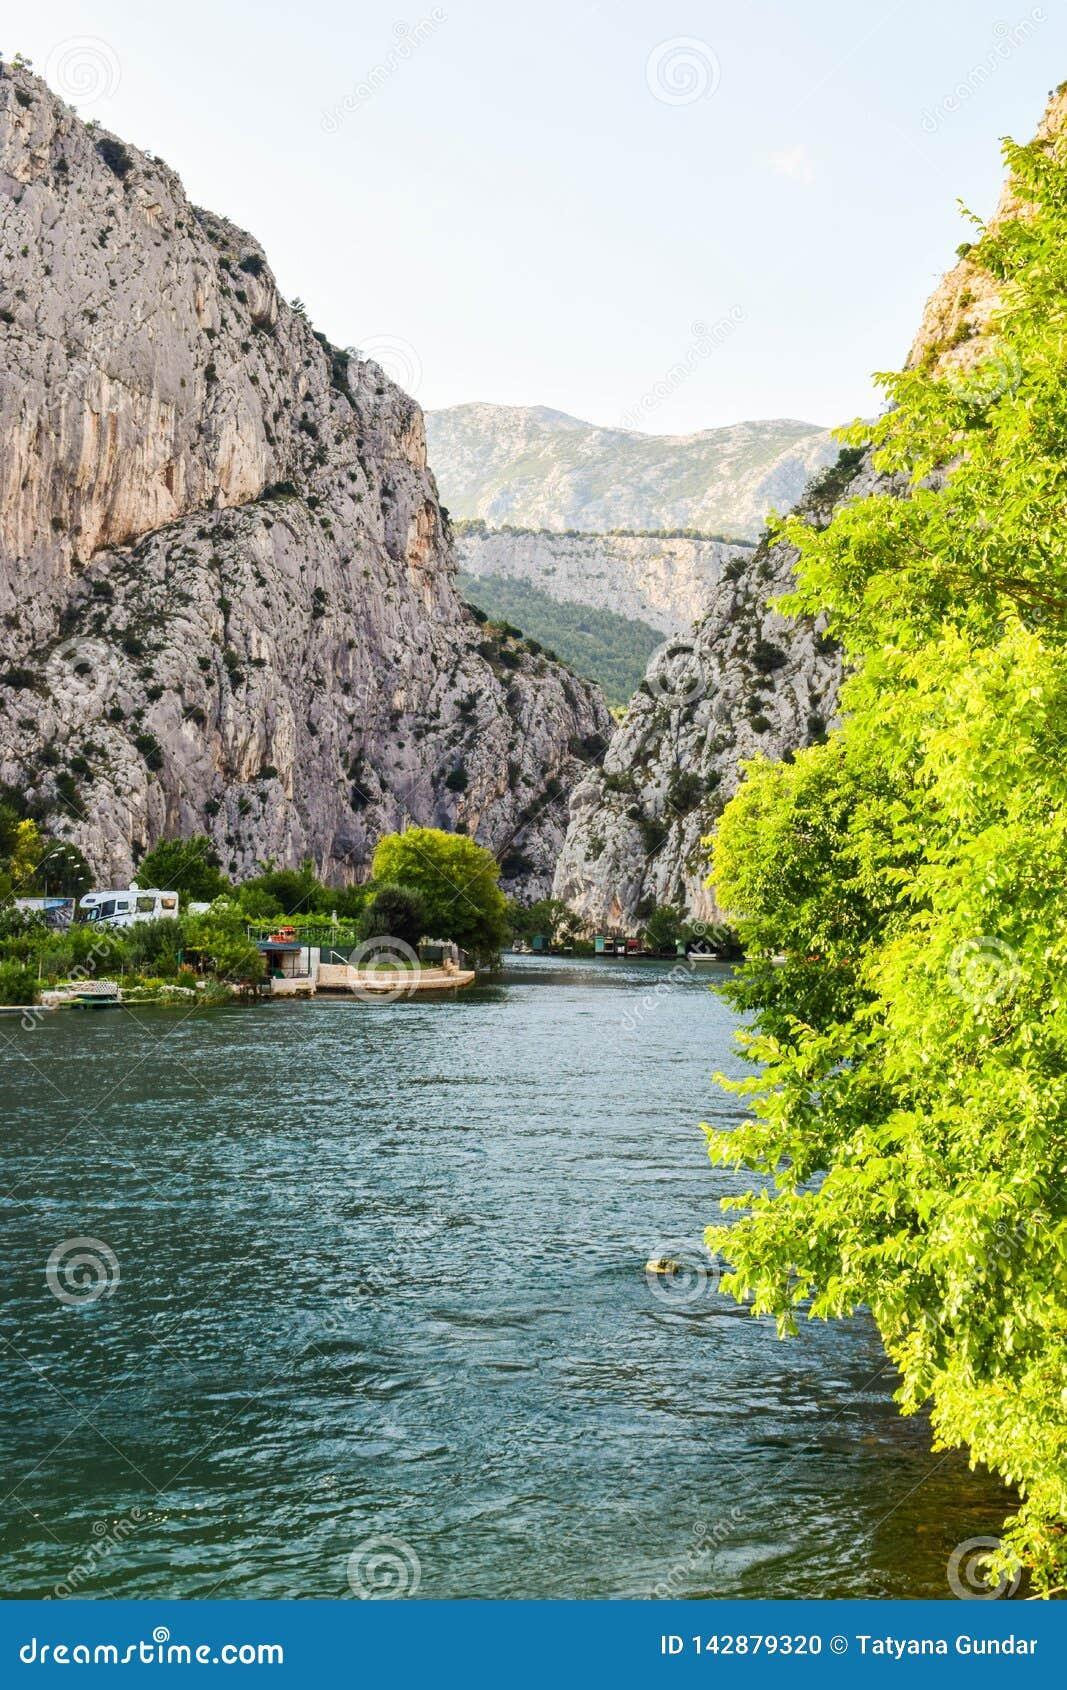 The Cetina River